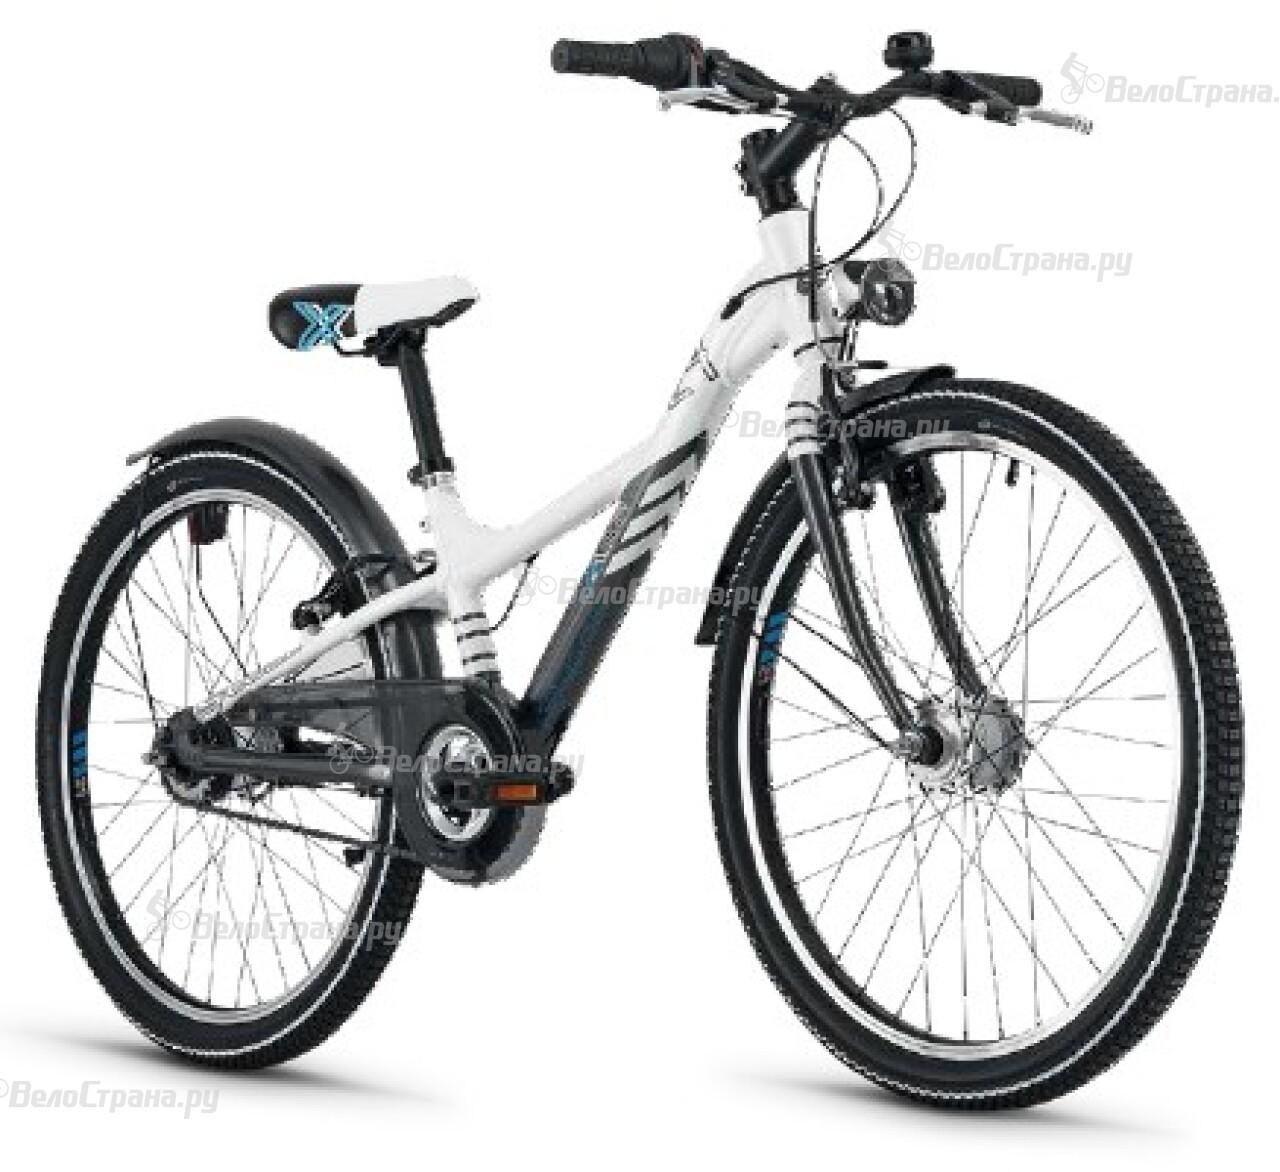 Велосипед Scool XX lite 24 7S (2014) цена